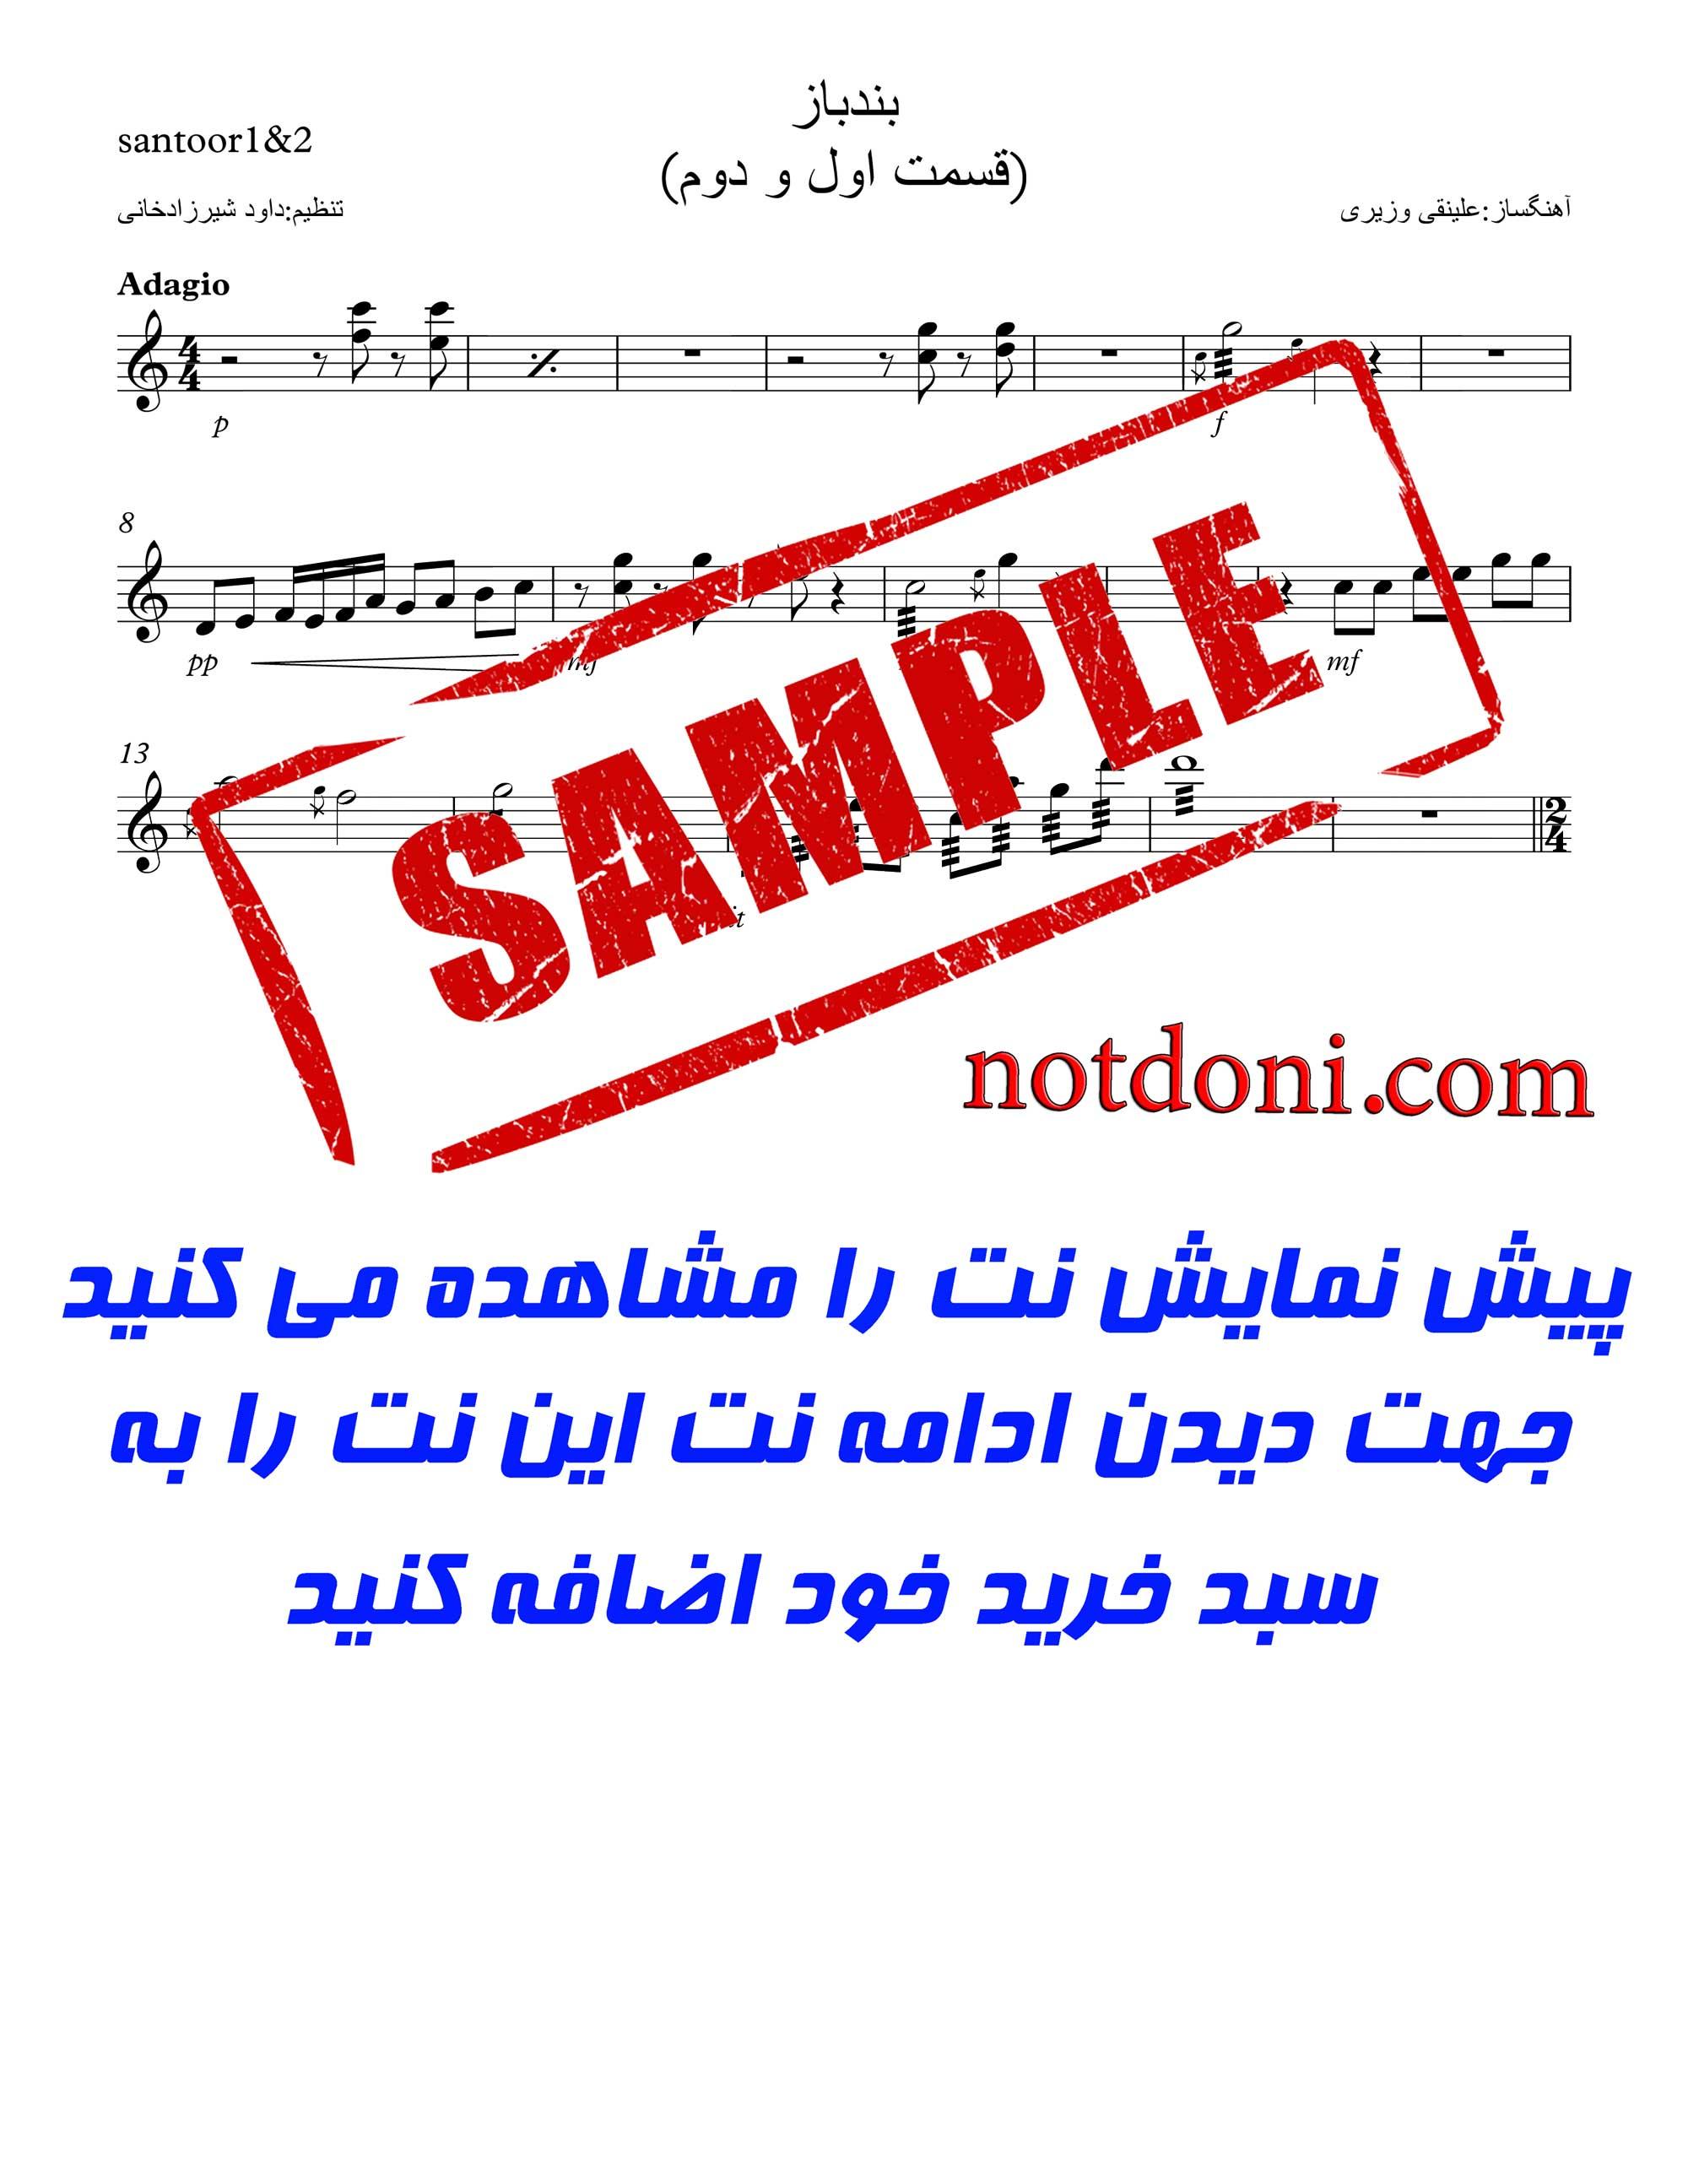 f00d63b5-a032-43cc-83c4-b7fc57bc77dd_دمو3.jpg